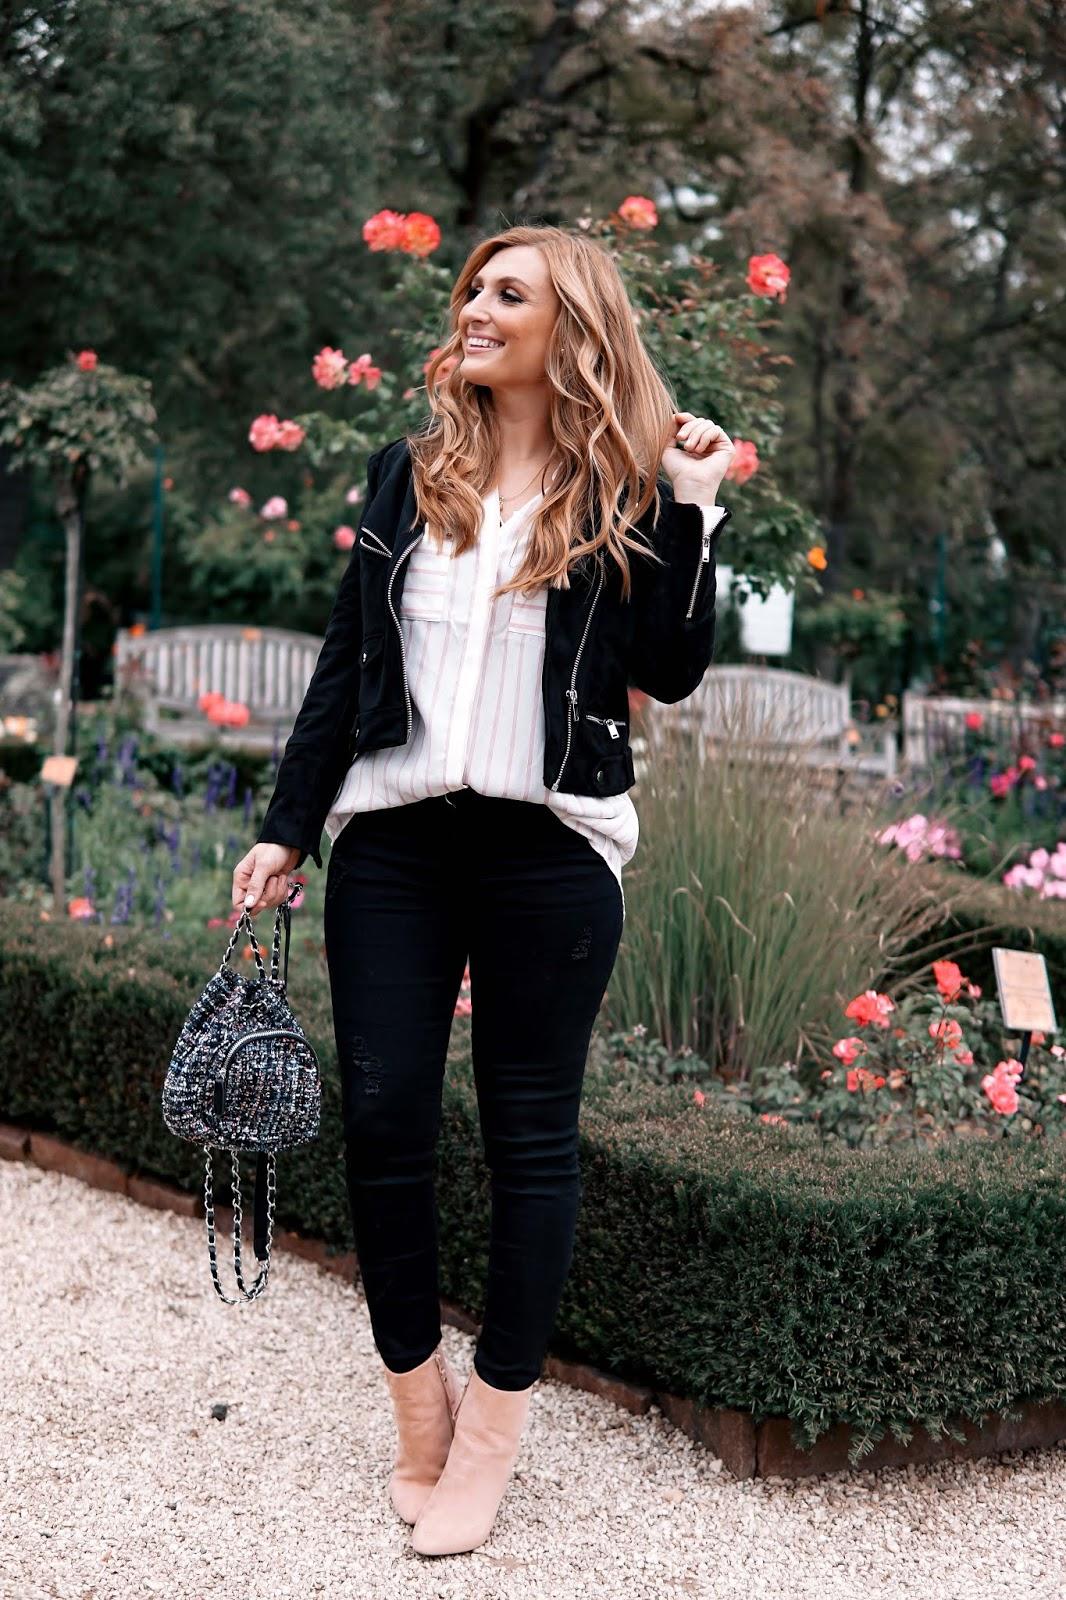 Herbstoutfit-inspiration-Oversize Bluse-Fashionstylebyjohanna-angesagte-Herbsttrends-Herbsttrend-Must-Have-Schwarze-Jeans-Stiefeletten-Schwarze-Lederjacke-kombinieren (2)